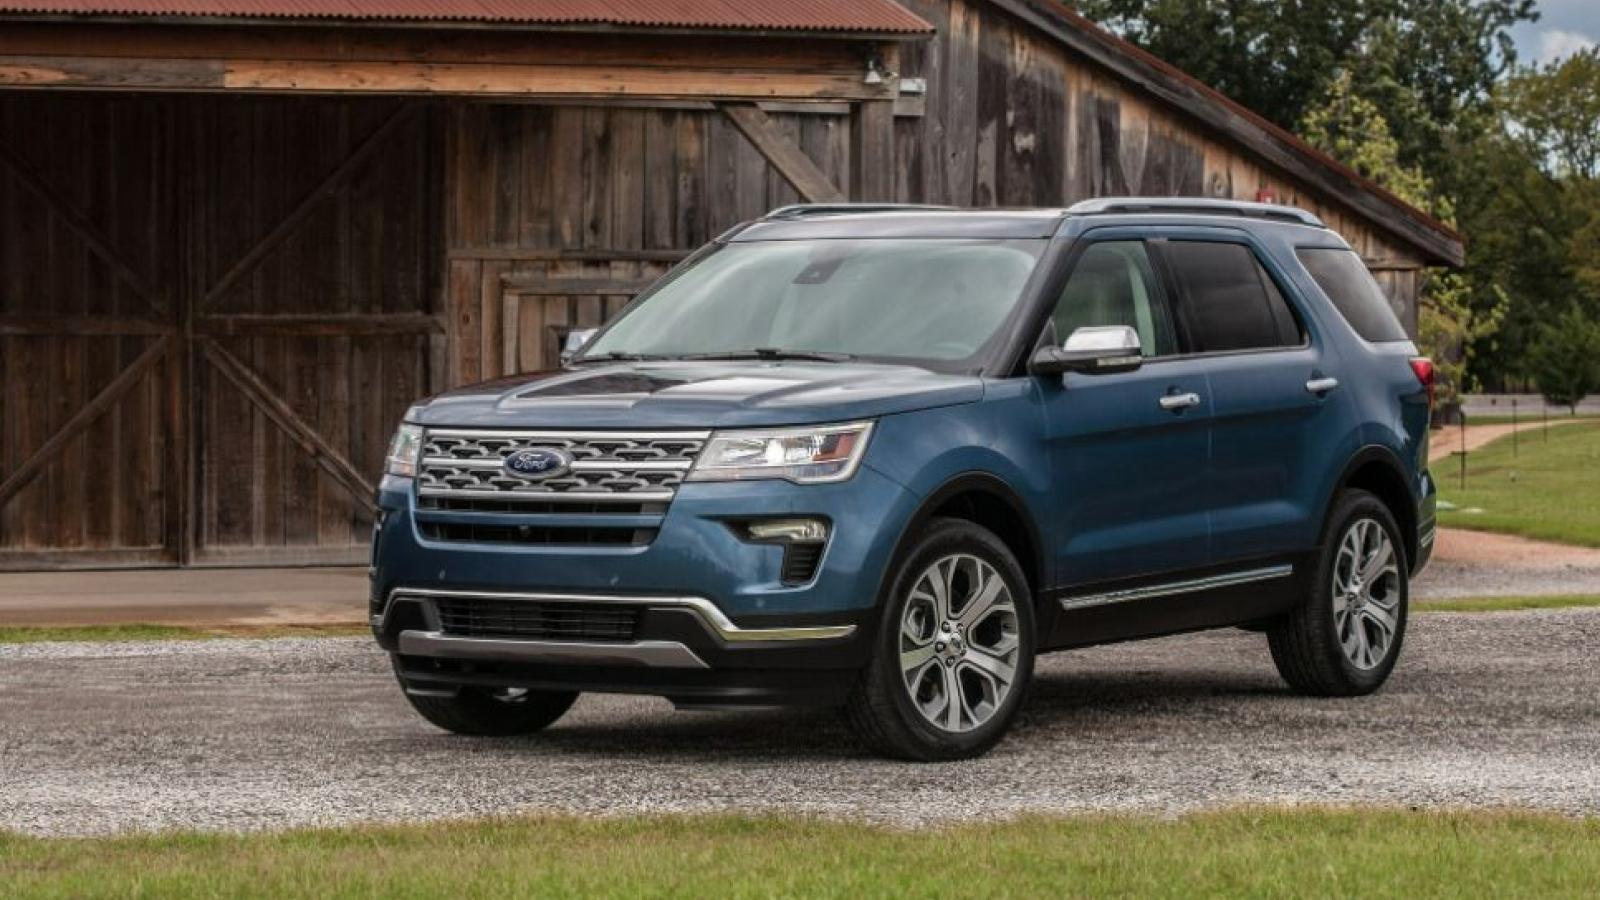 Ford triệu hồi 661.000 mẫu Explorer tại Bắc Mỹ